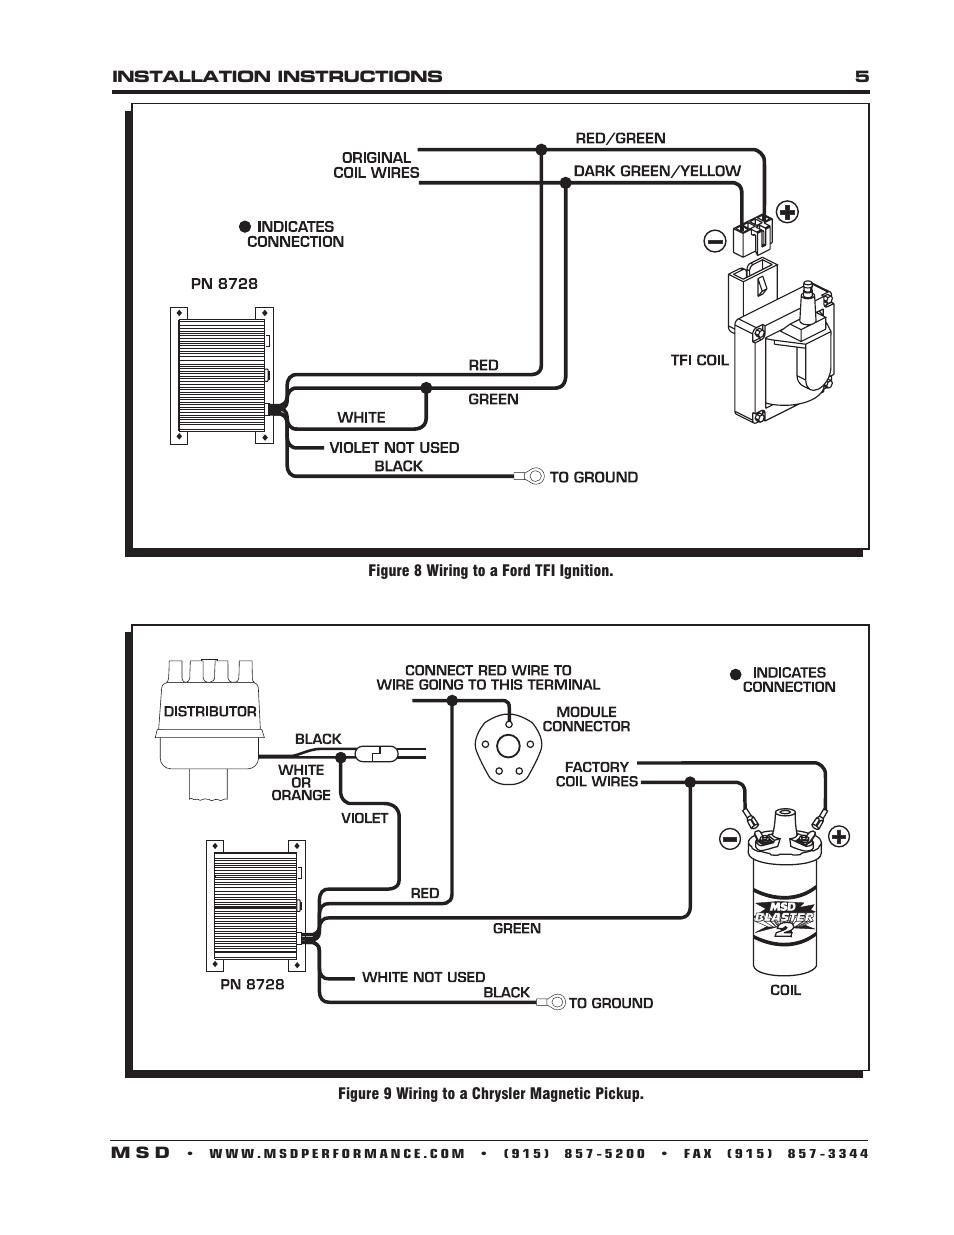 Touch Wiring Diagram - Wiring Diagram G11